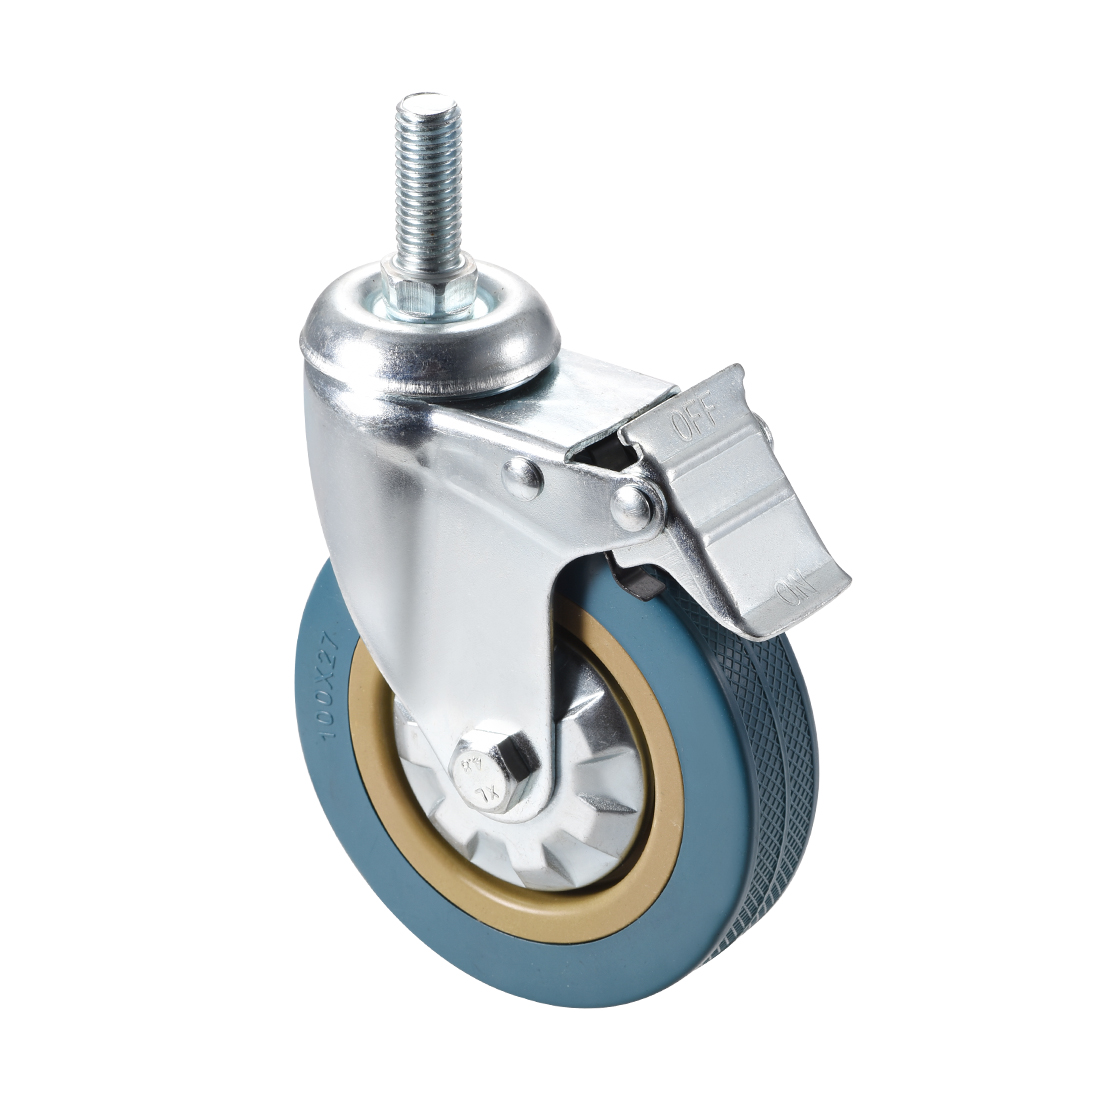 sourcing map Swivel Caster Wheels PU Caster 4 Inch Dia Wheel M12 x 60mm Threaded Stem 286lb Capacity 4pcs